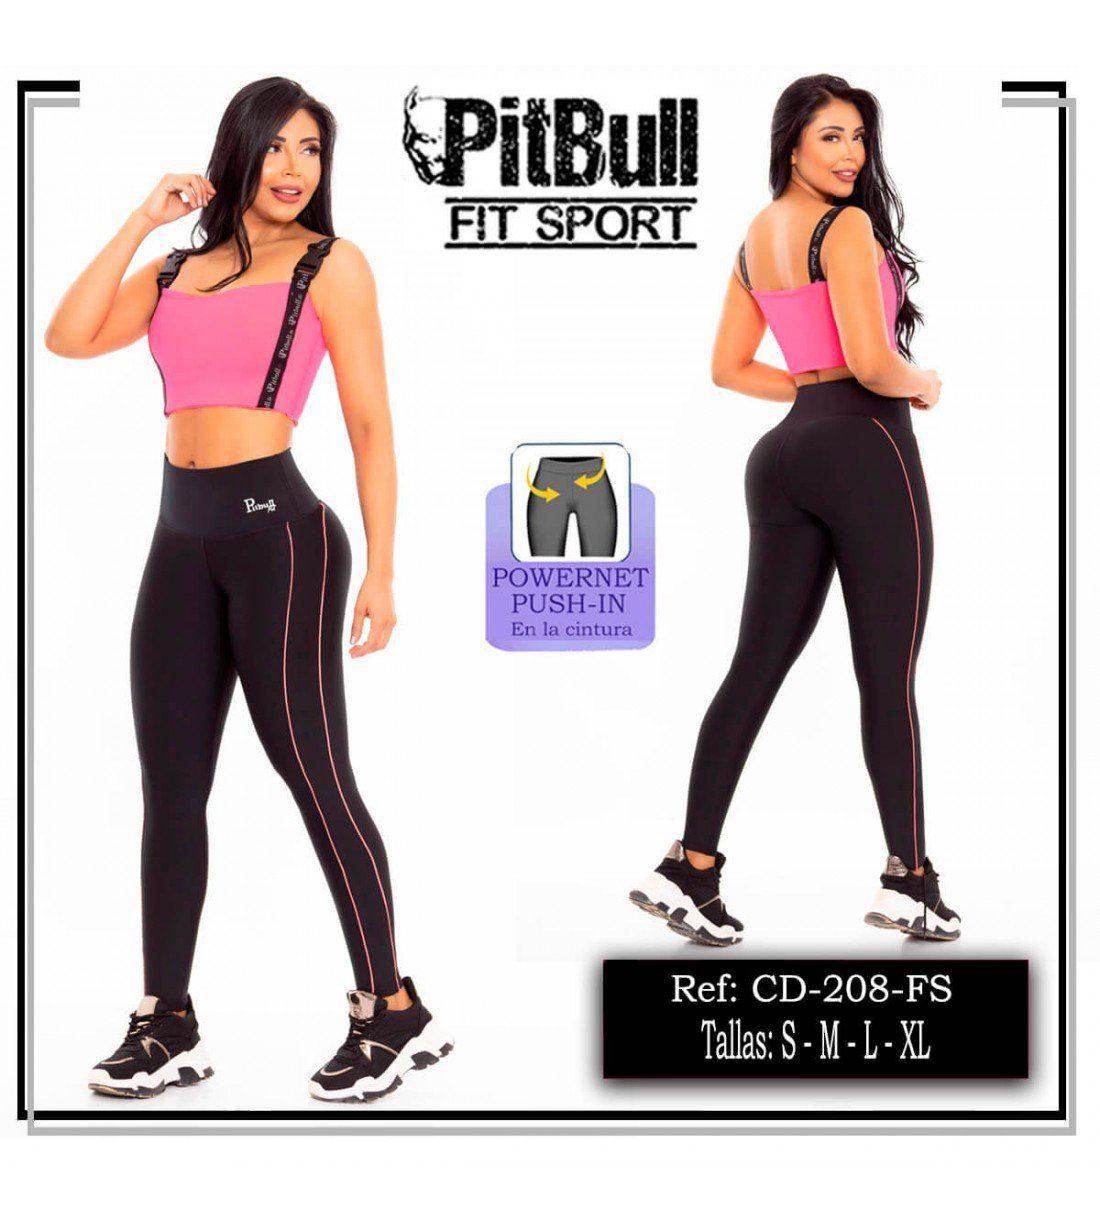 Conjunto Deportivo de la marca Pitbull CD208